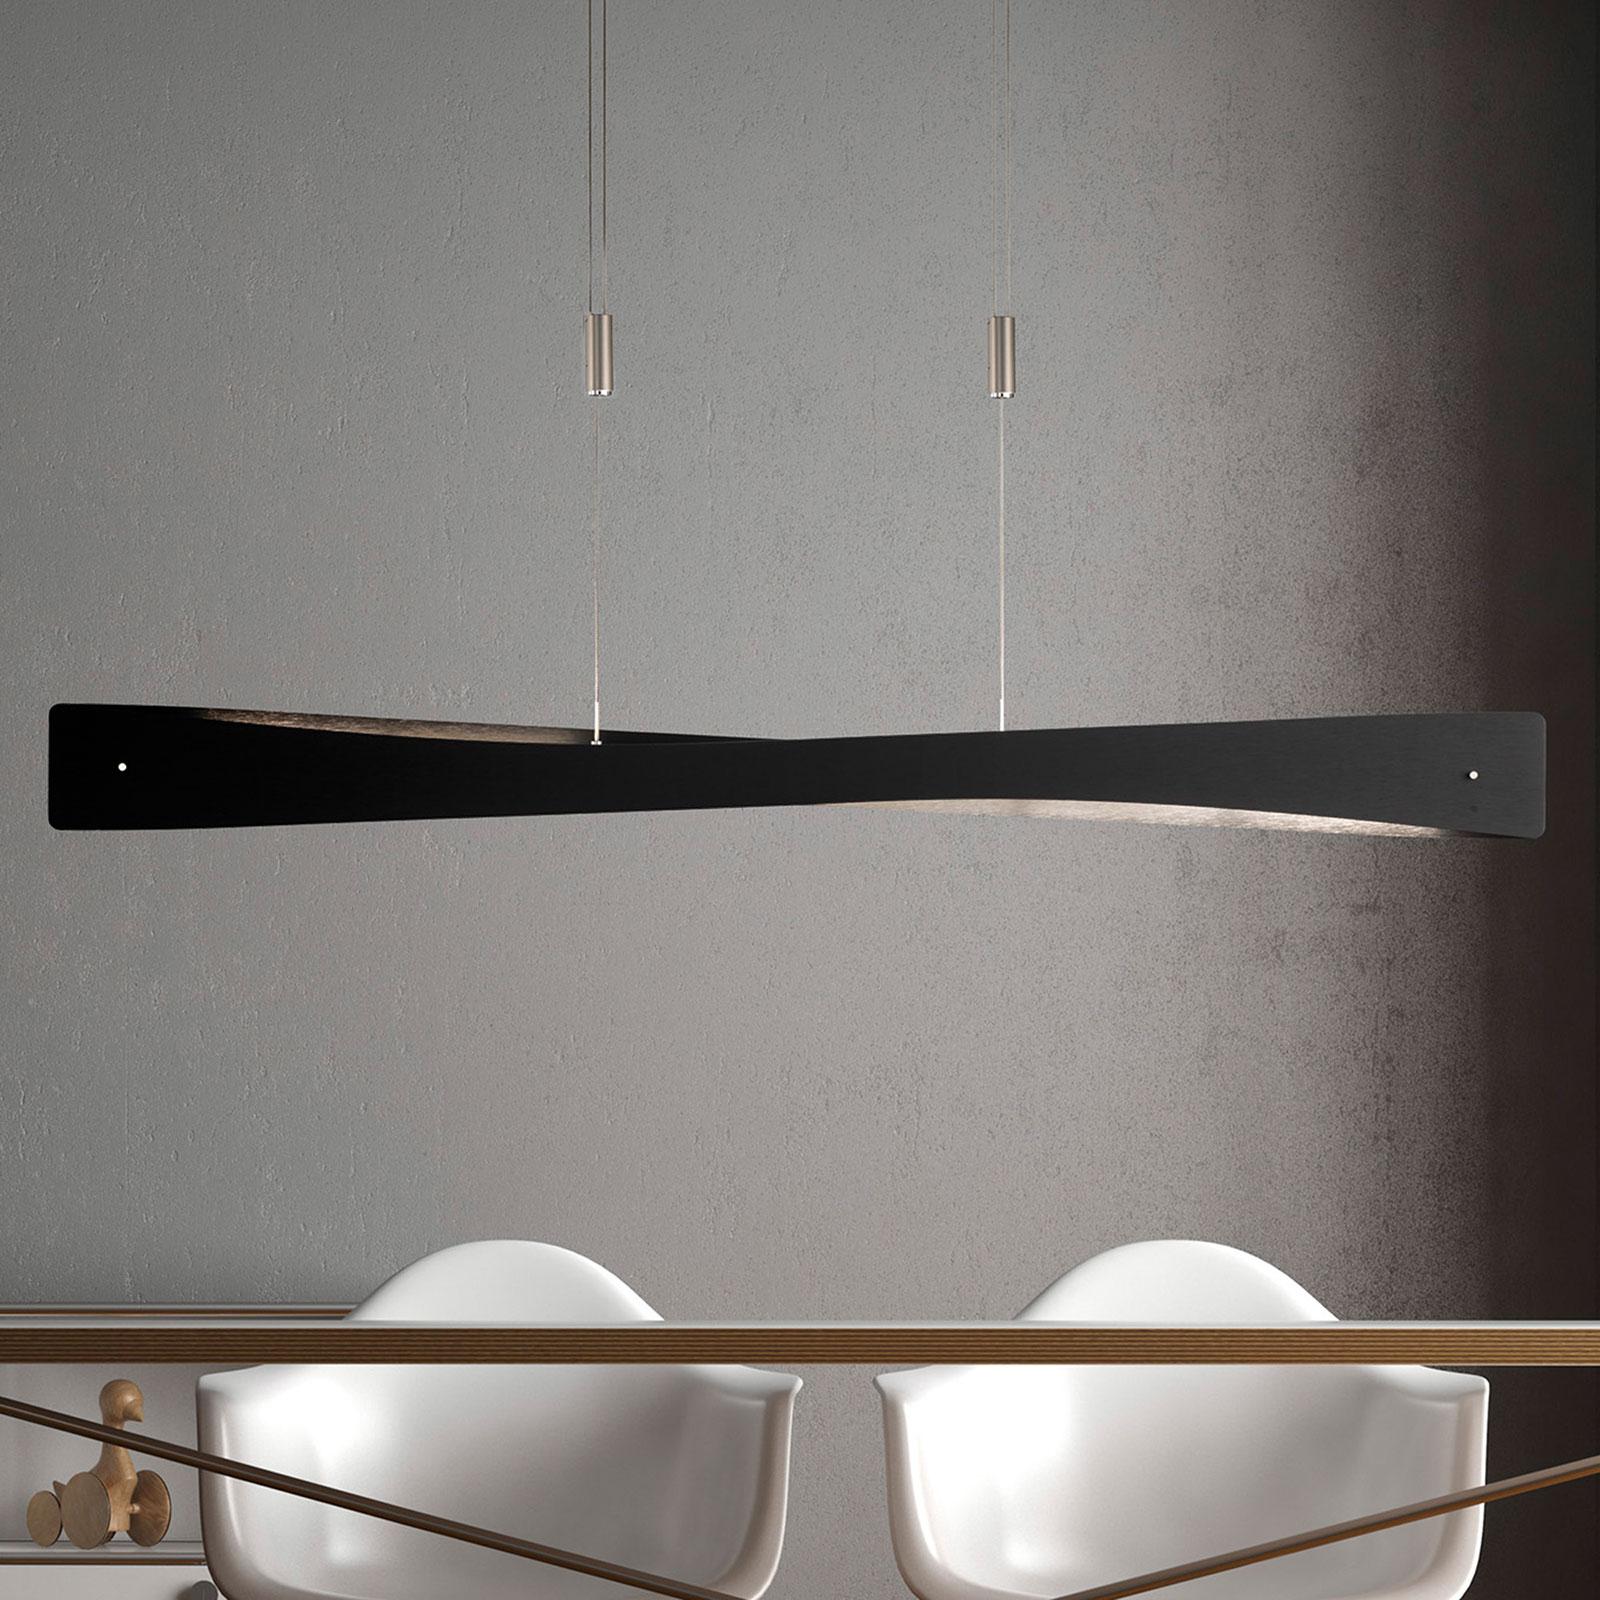 Lucande Lian LED-hänglampa, svart, aluminium